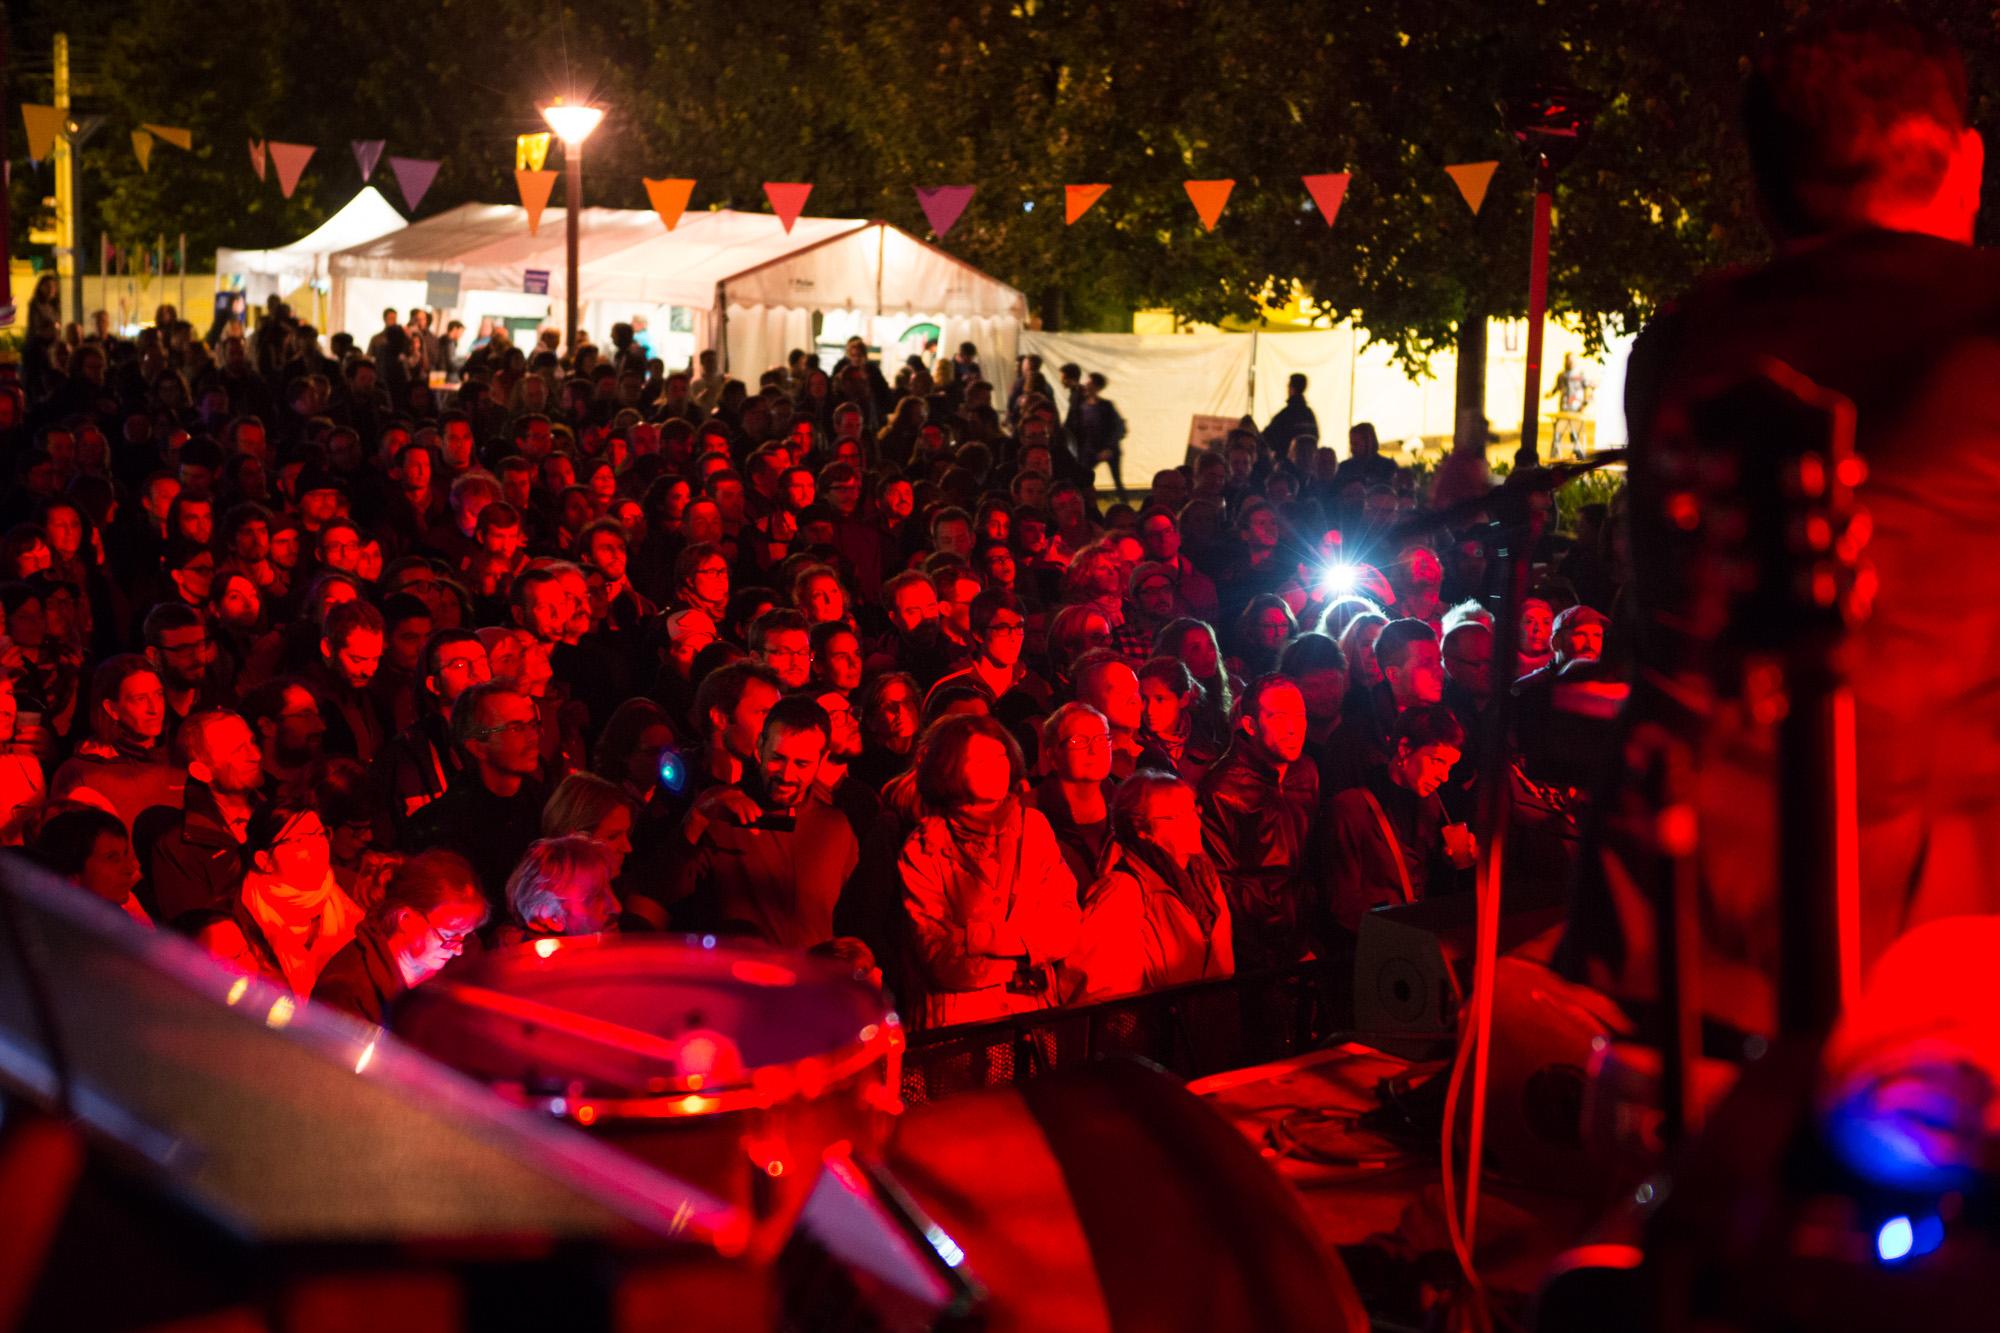 les-georges-festival-musique-fribourg-pierre-yves-massot-photographe.jpg